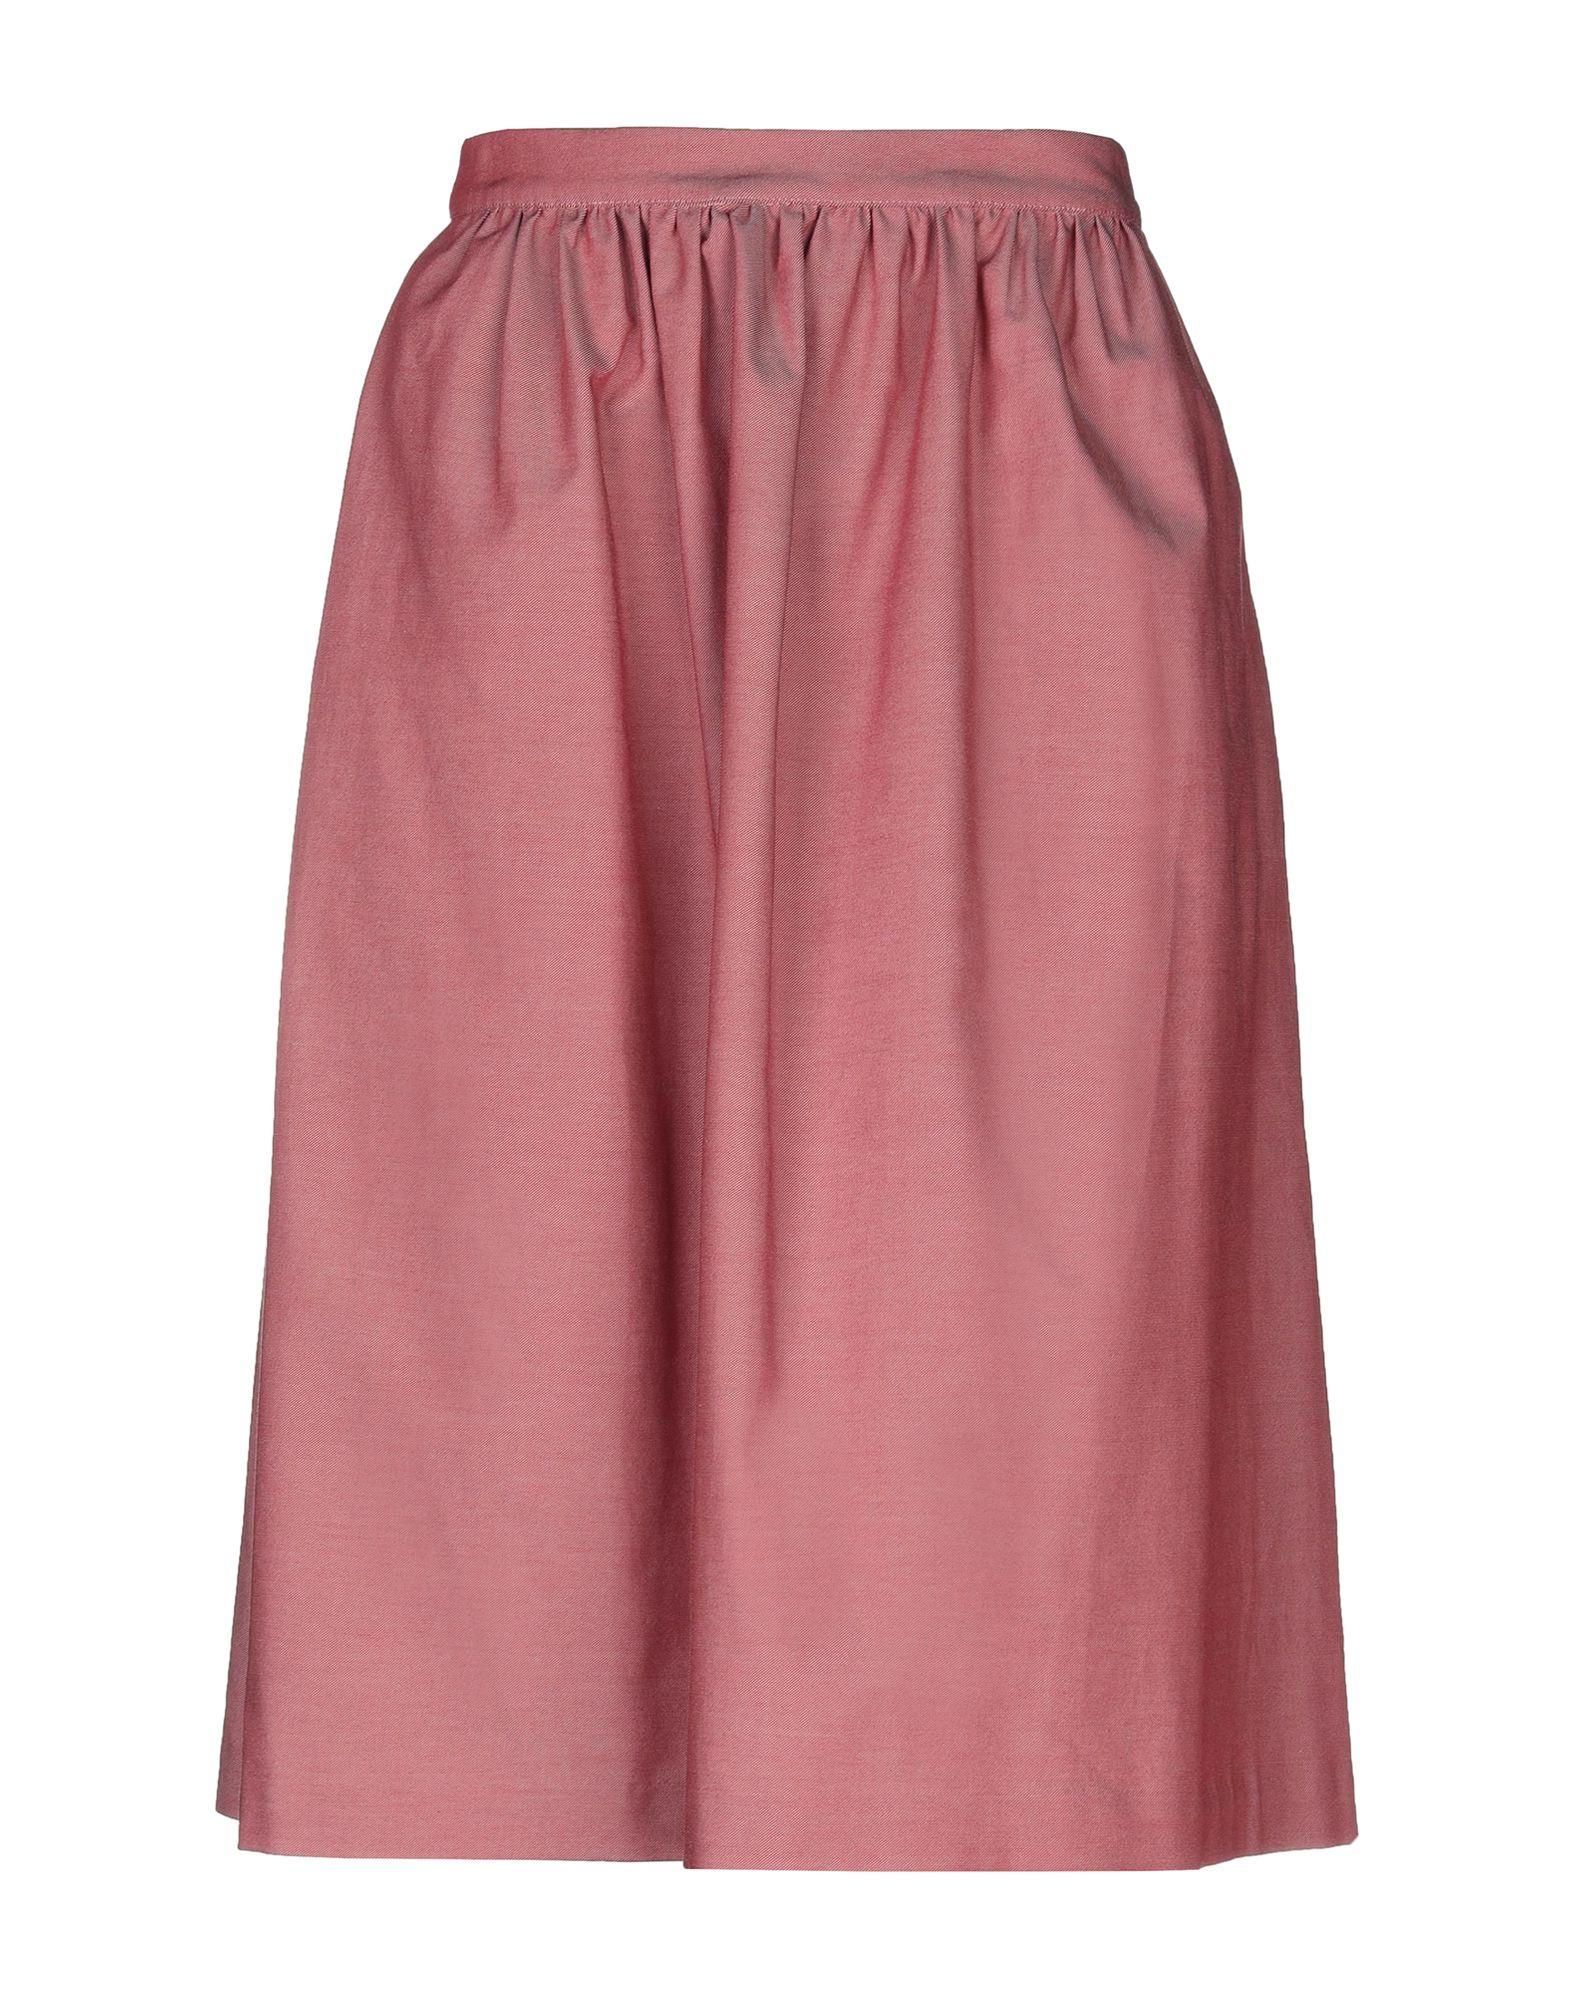 ALESSANDRA GIANNETTI Юбка длиной 3/4 alessandra rich юбка длиной 3 4